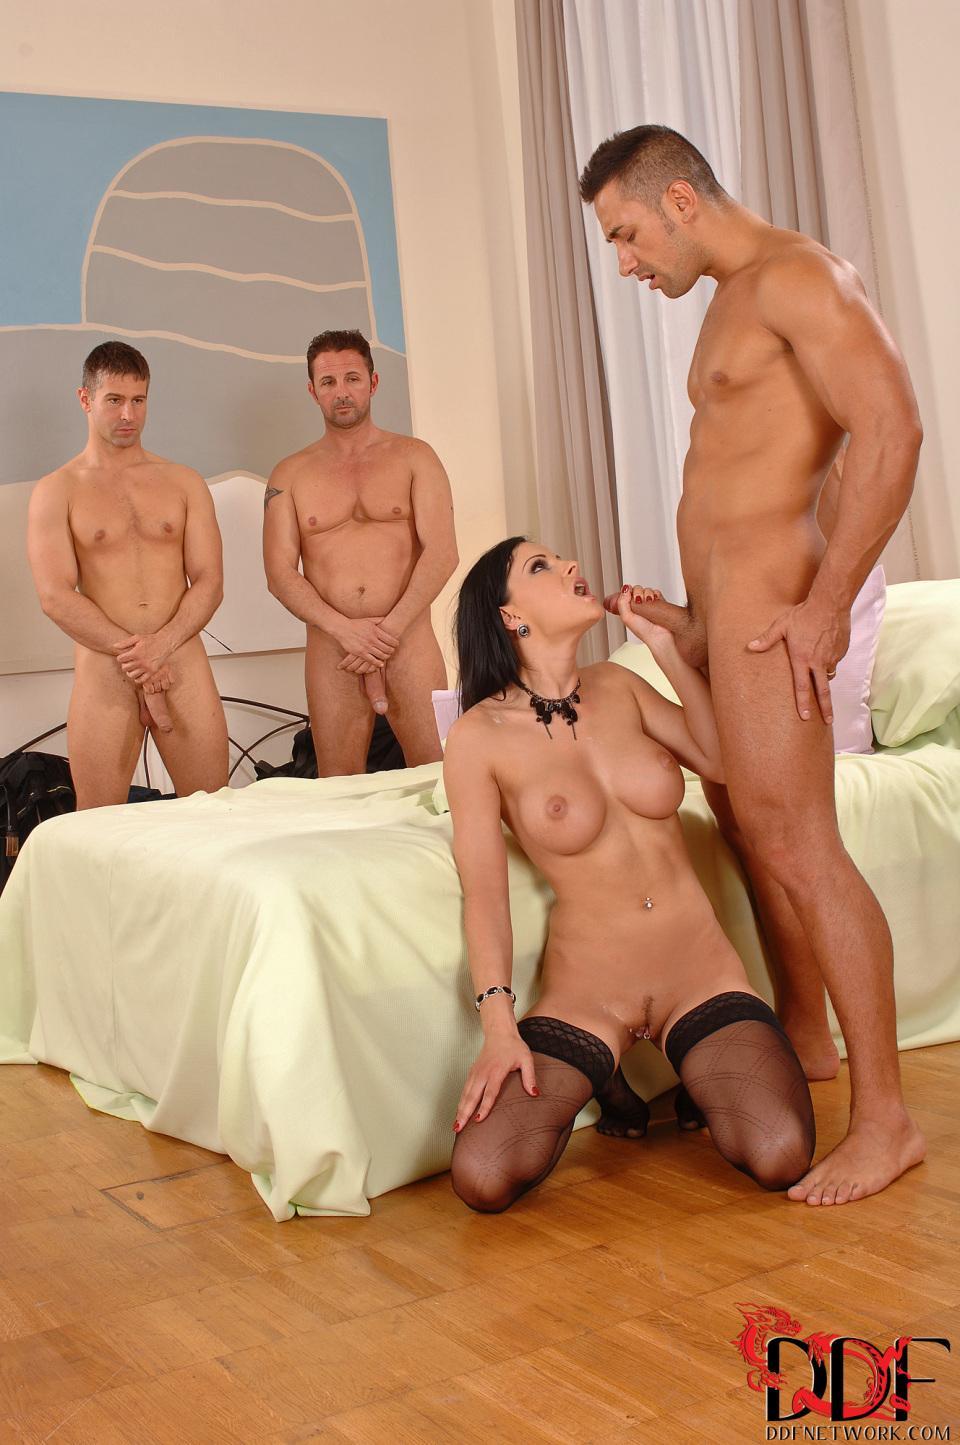 Mature husbands bisexual